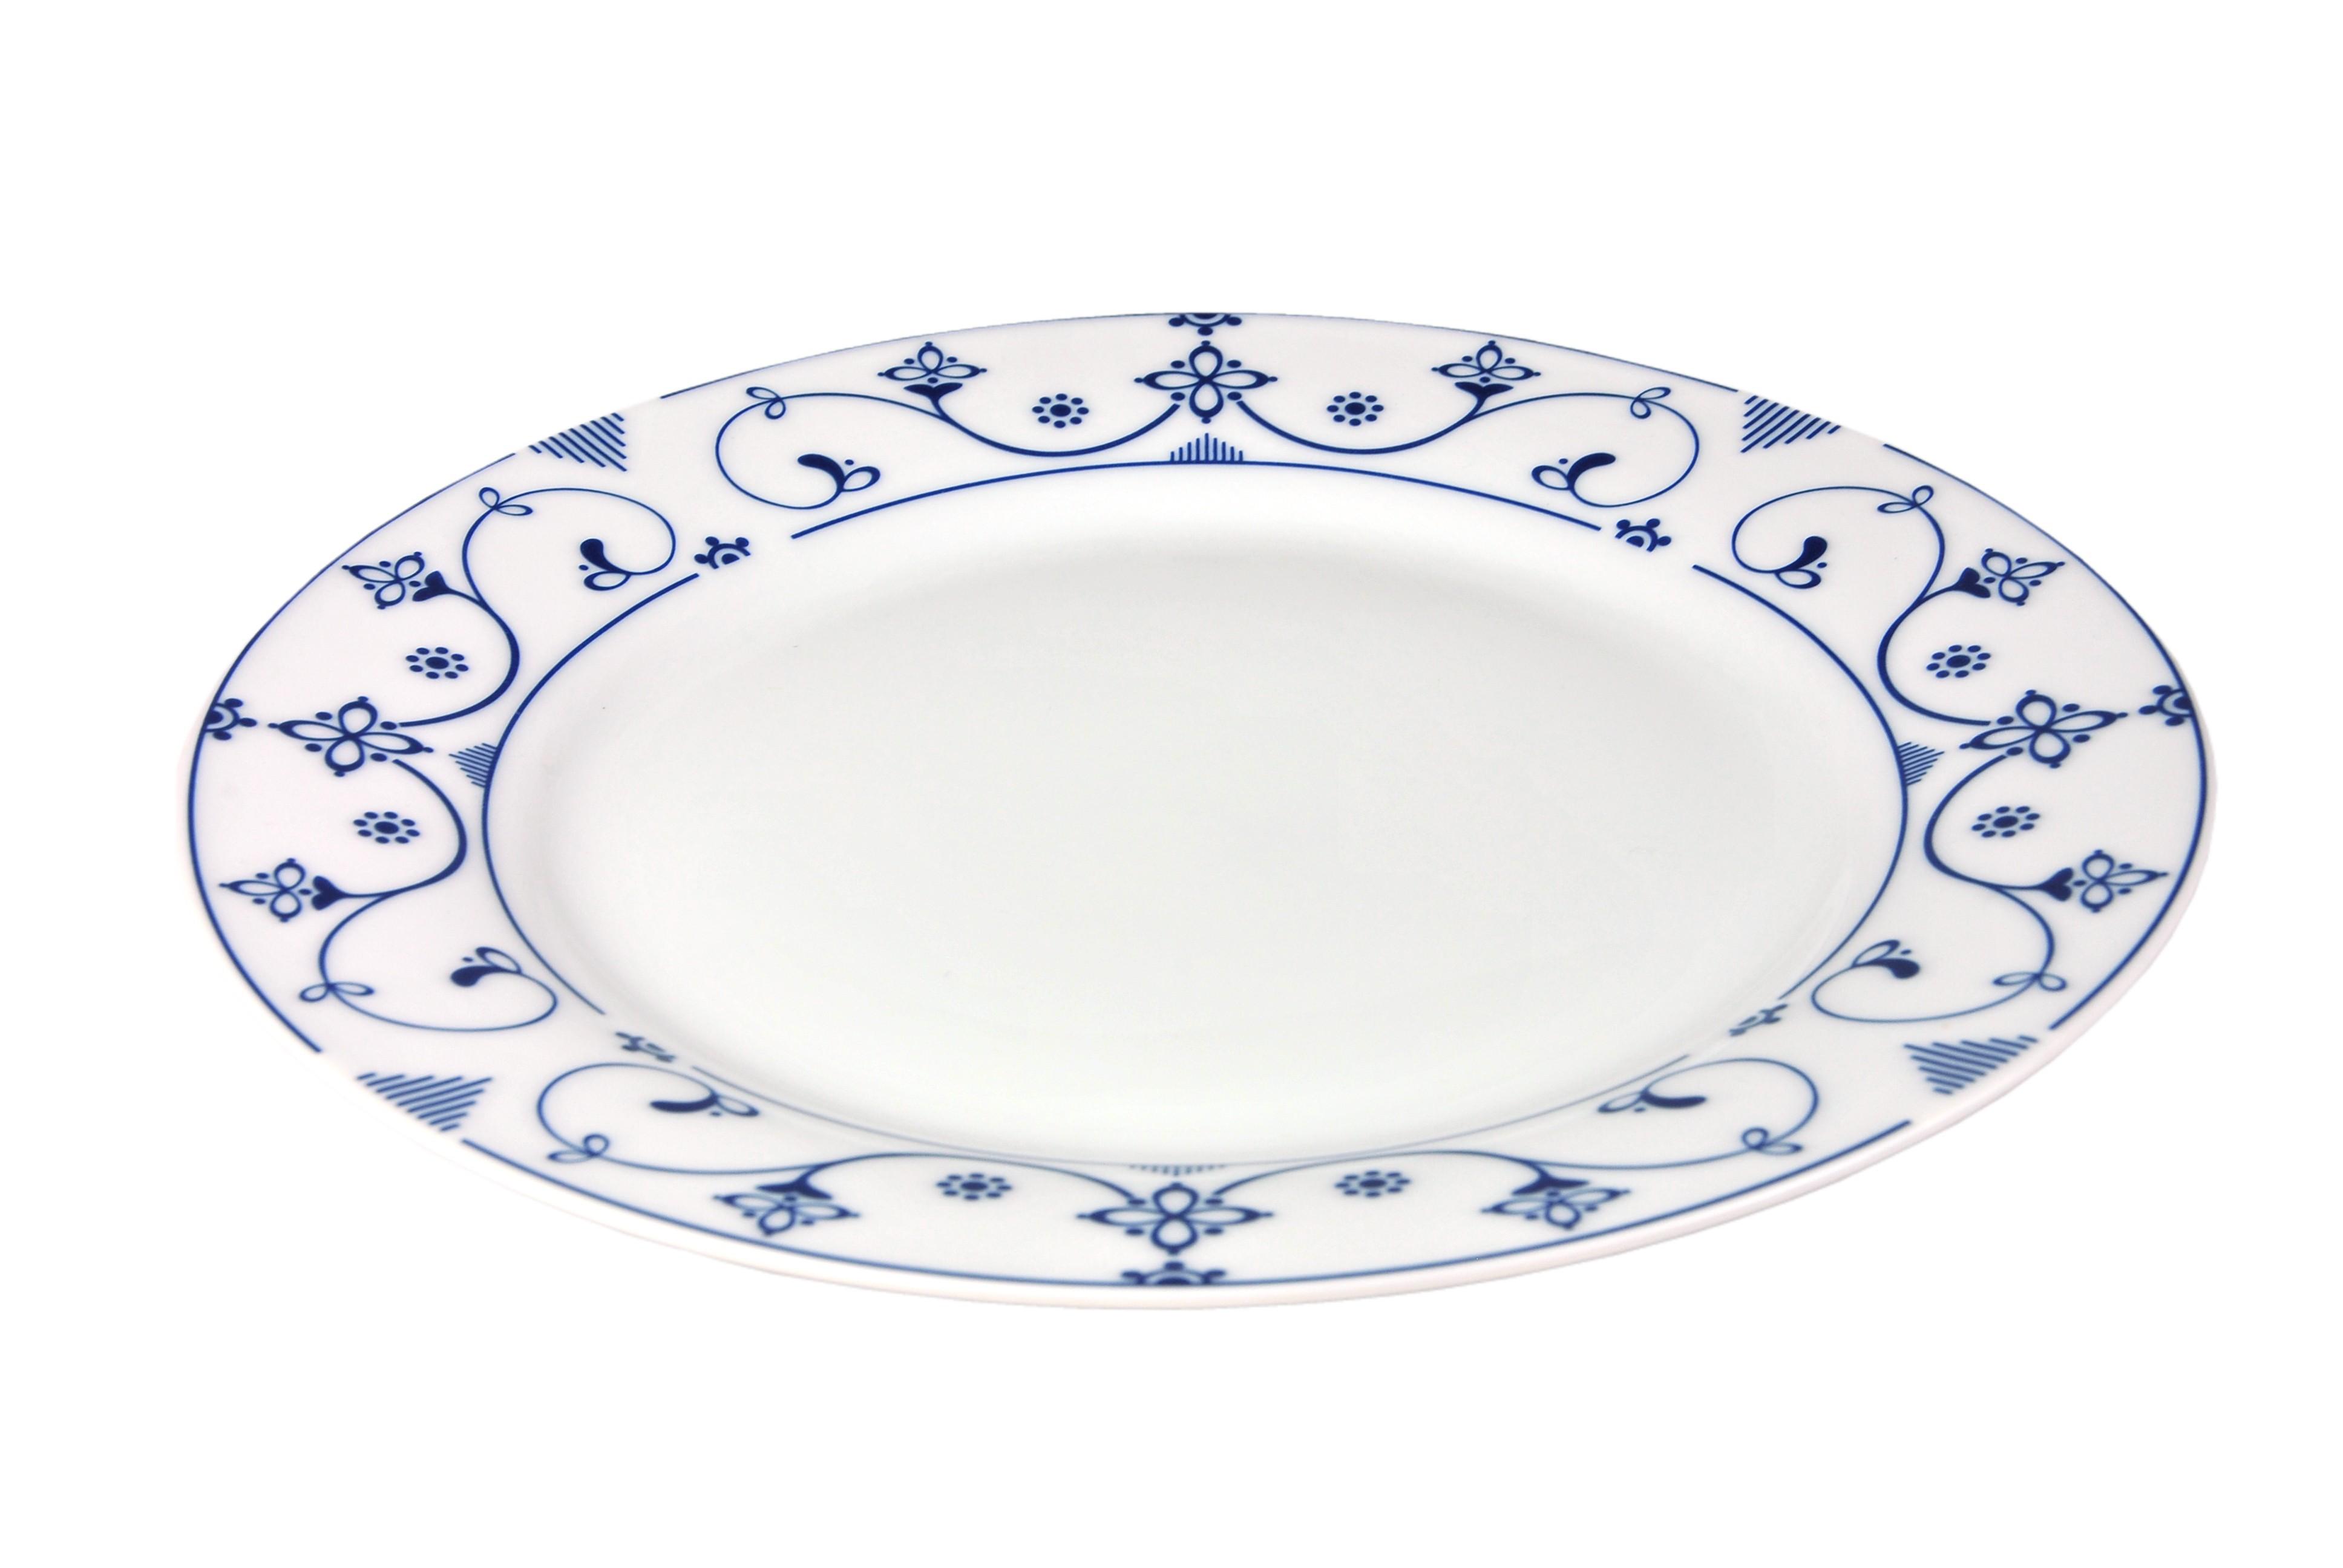 tafelservice indisch blau 24 tlg wei mit farbigem dekor f r 12 personen porzellan tafelservice. Black Bedroom Furniture Sets. Home Design Ideas